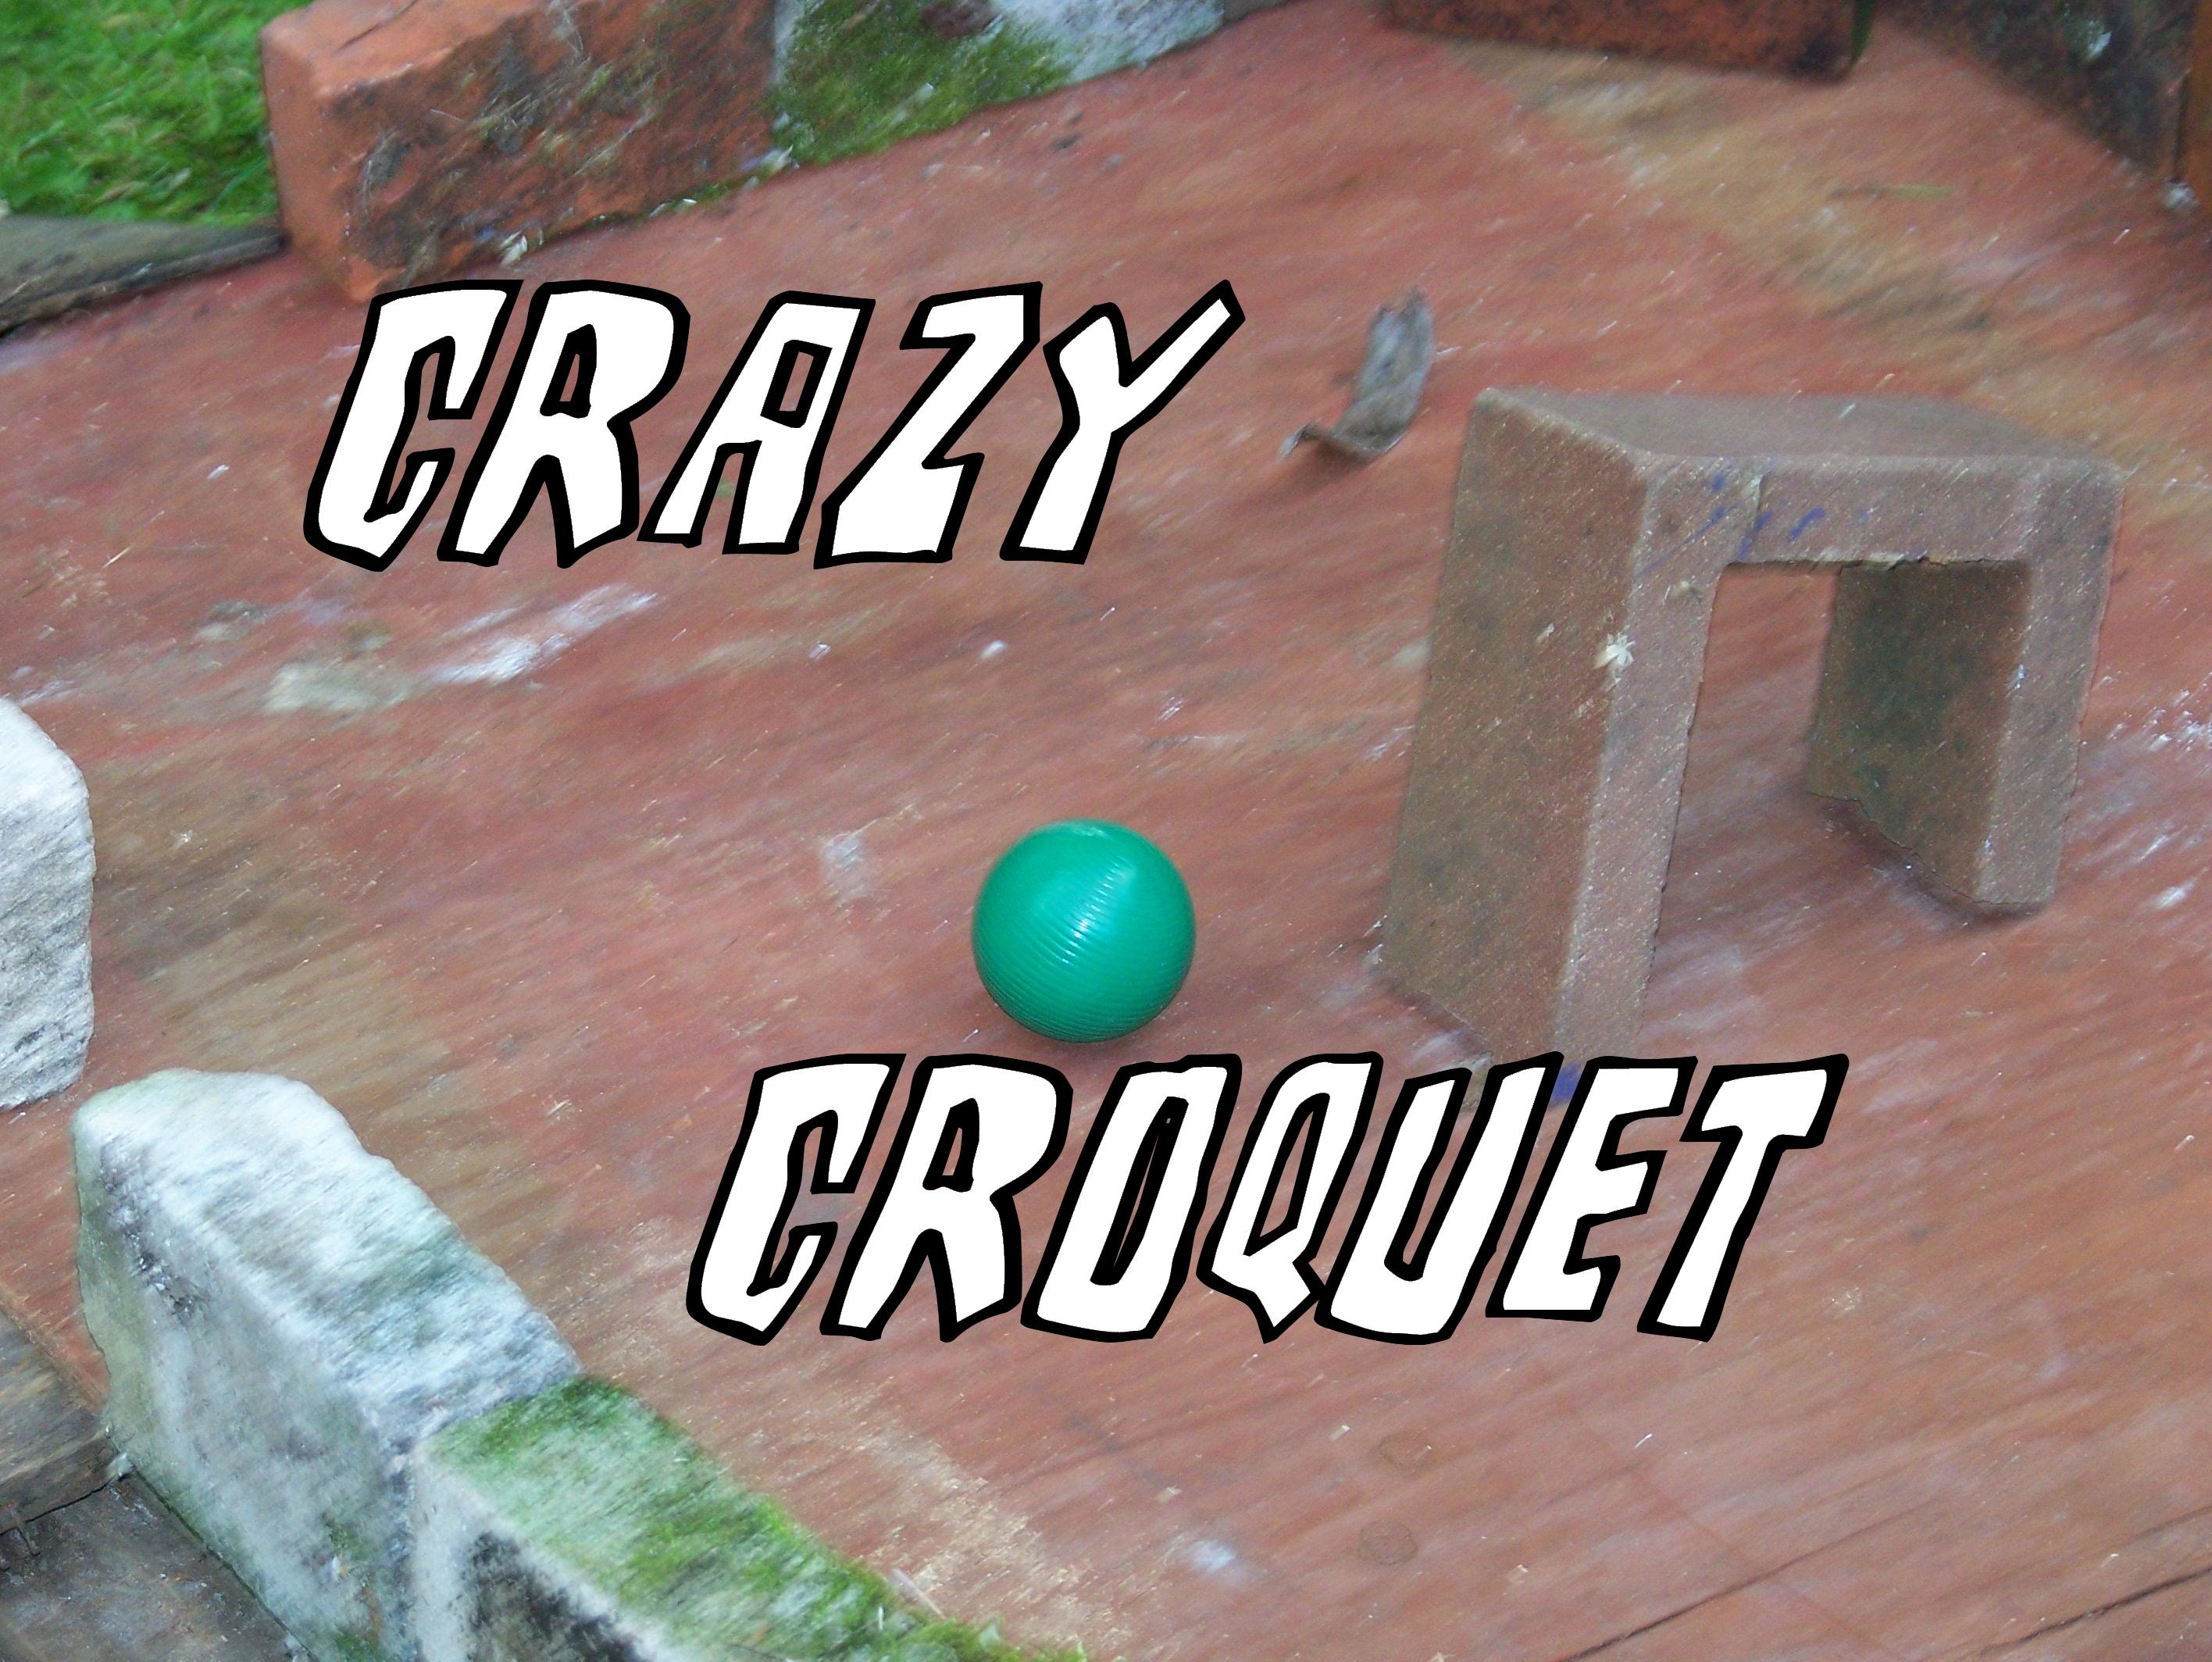 Picture of Crazy Croquet!